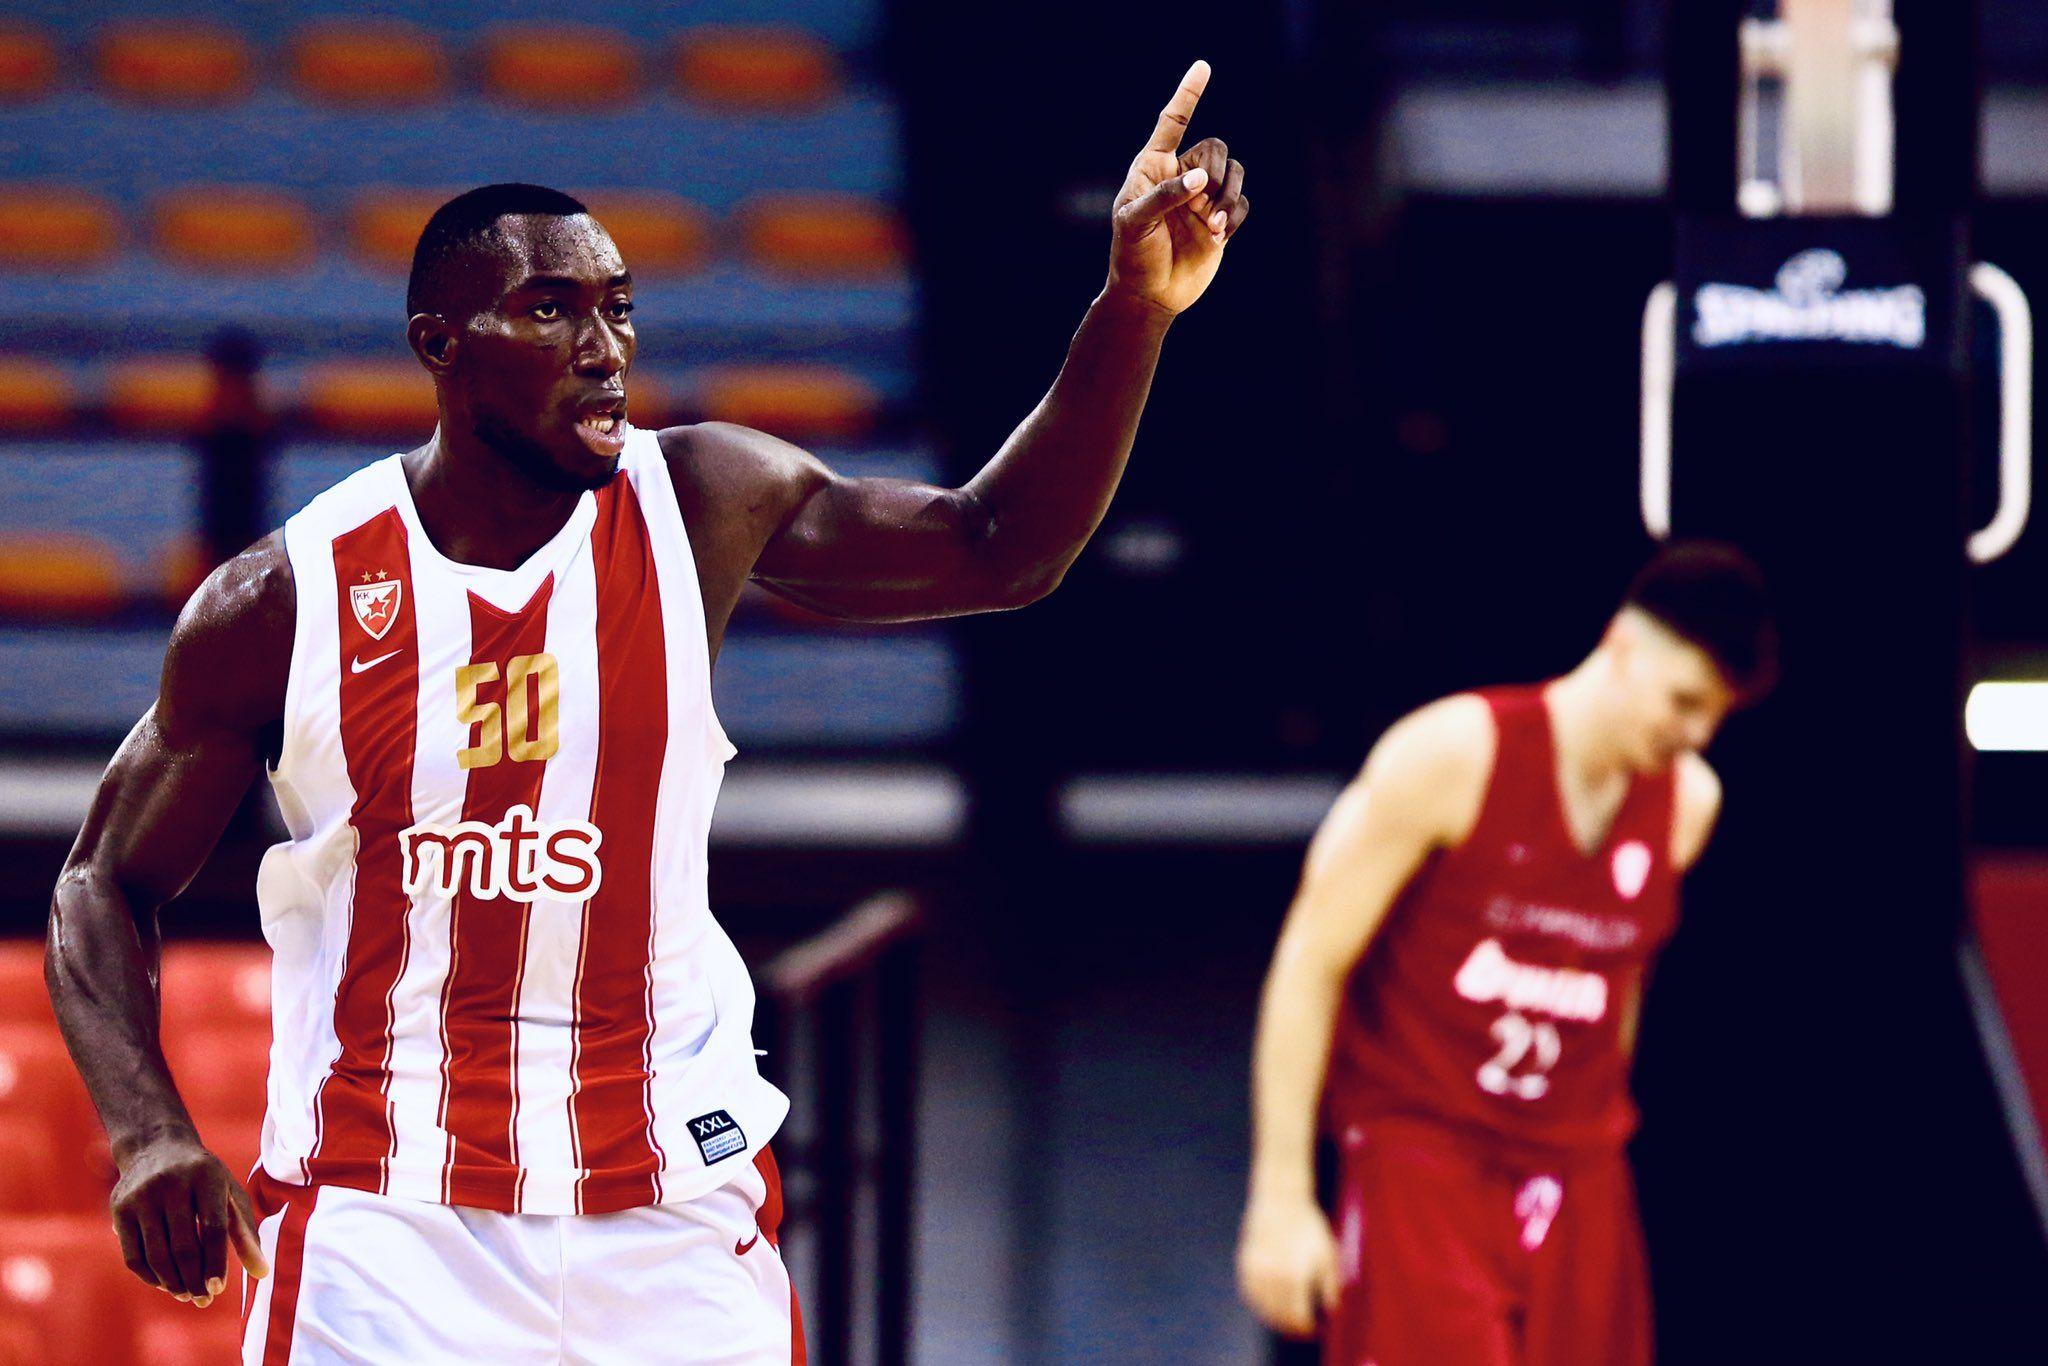 Michael Ojo, mort als 27 anys | Olympiacos BC